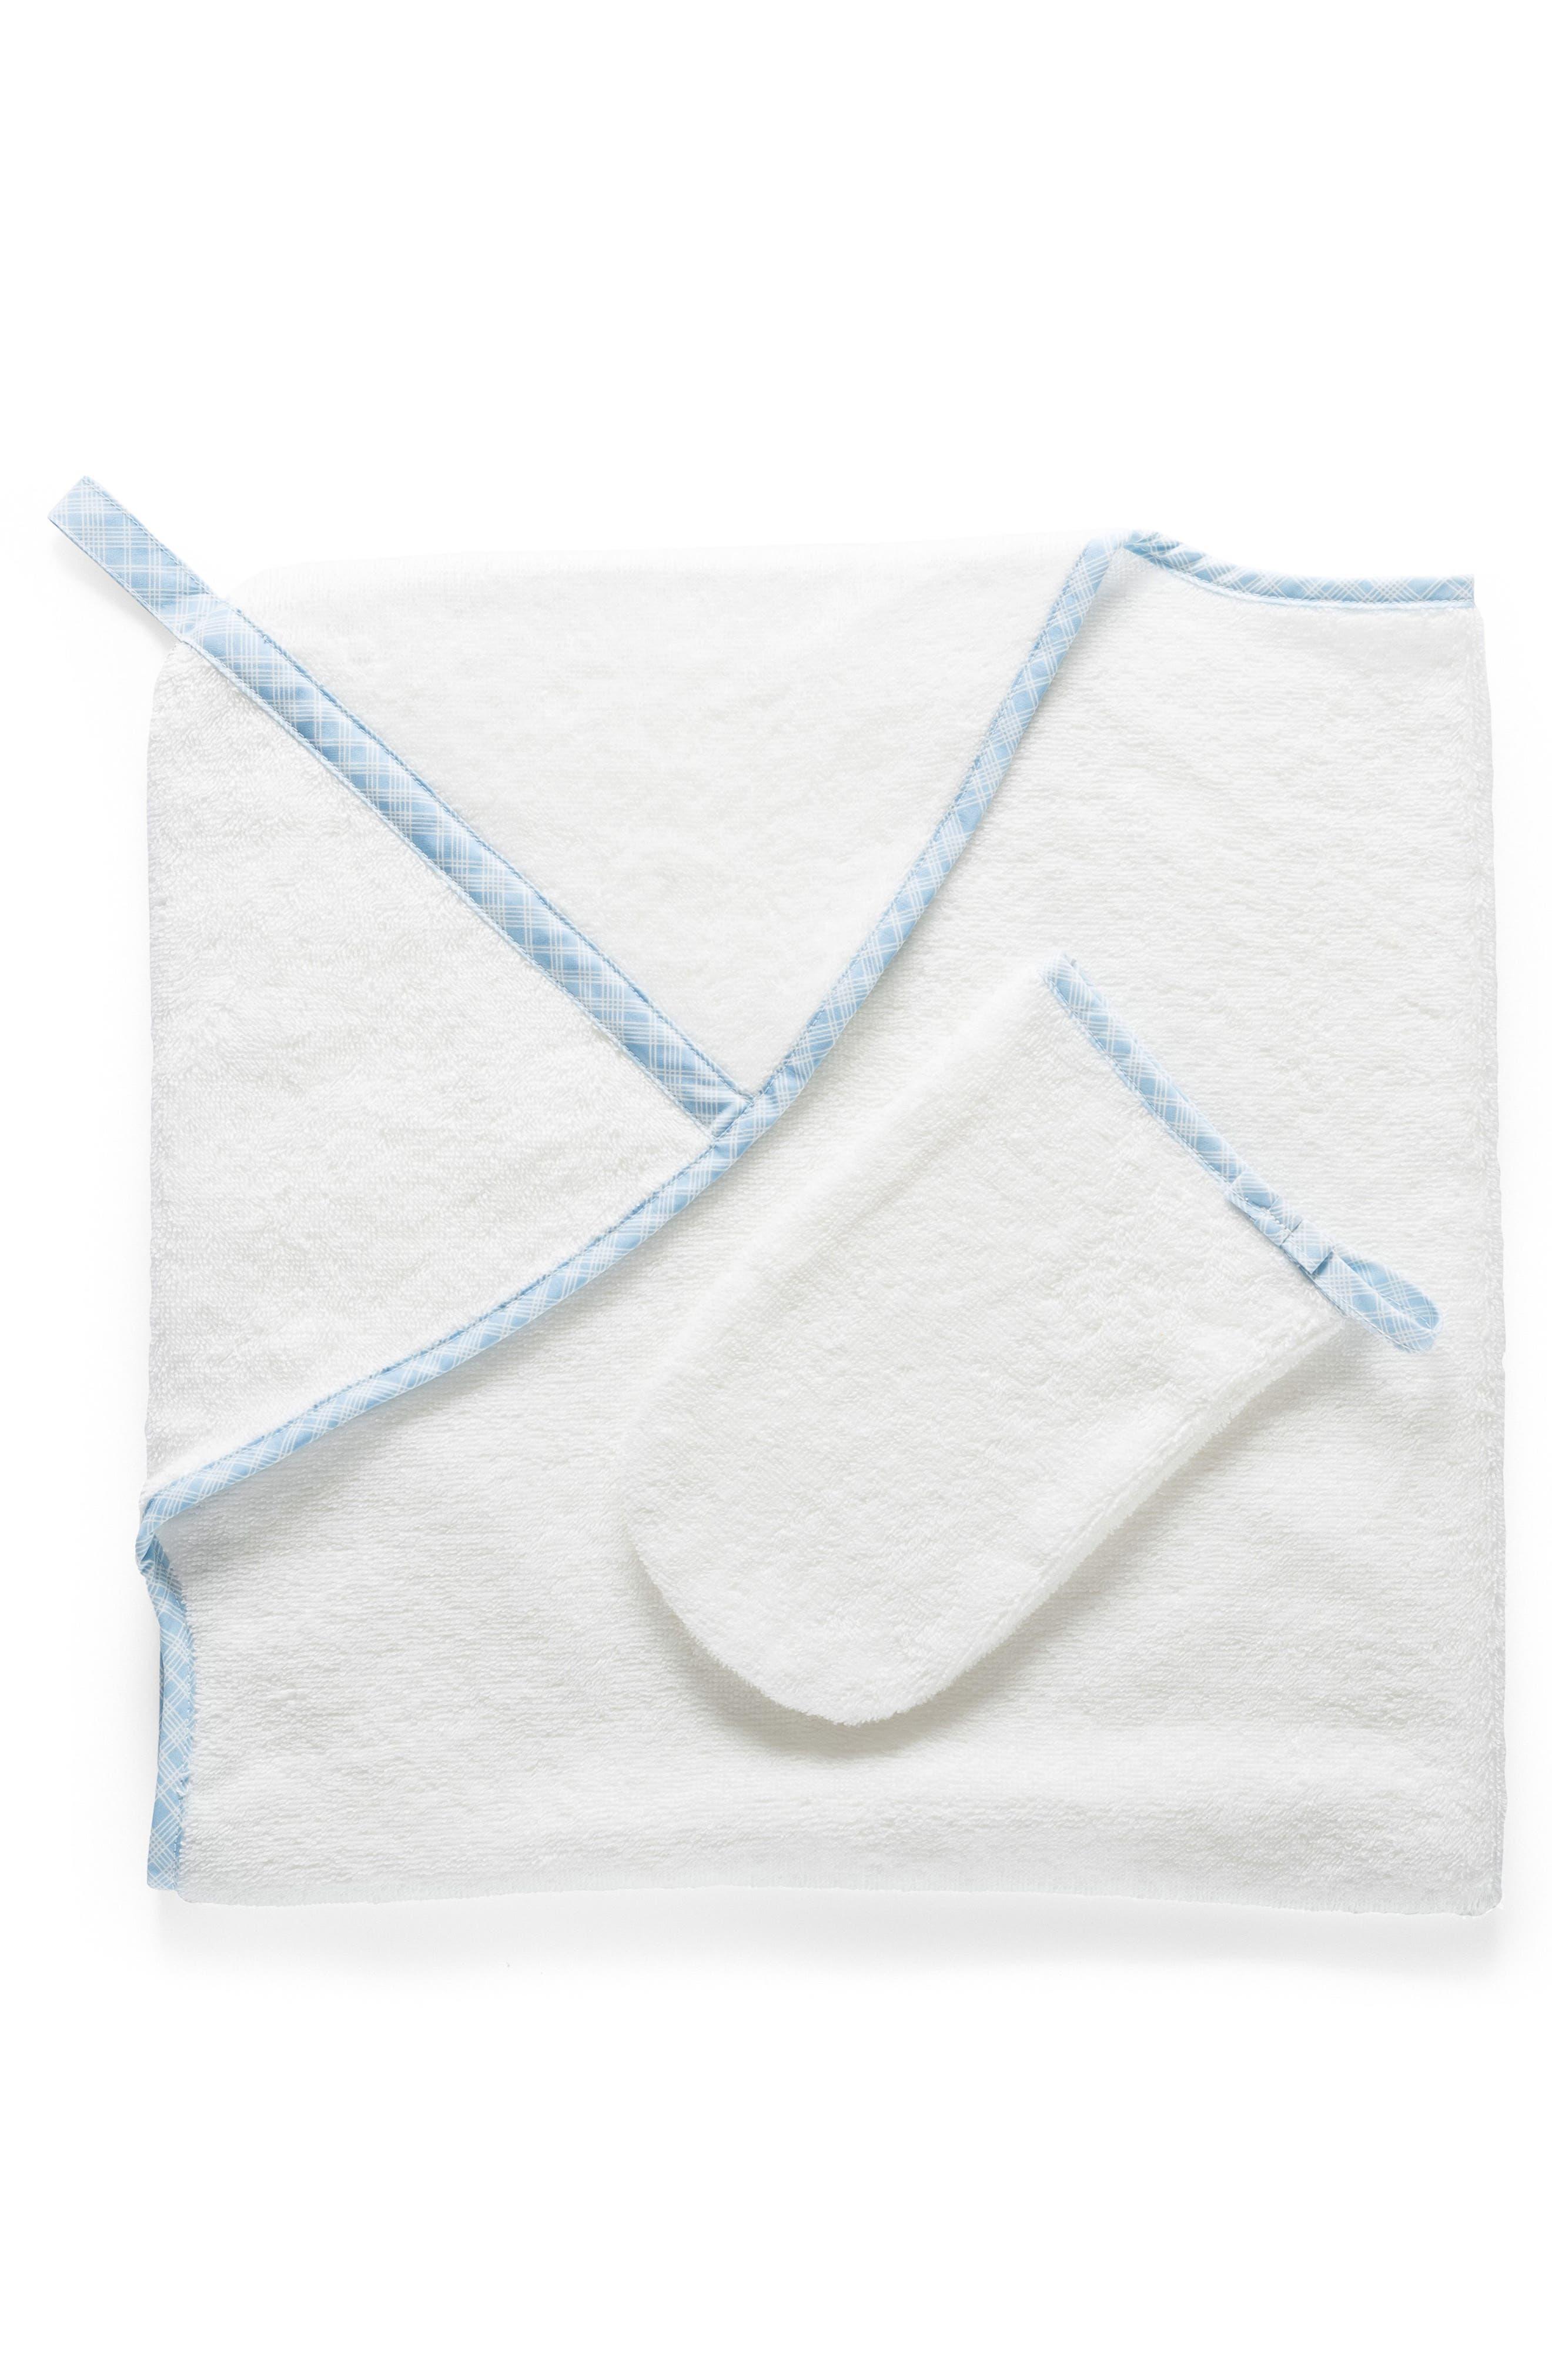 Hooded Towel & Bath Mitt Set,                         Main,                         color, 499